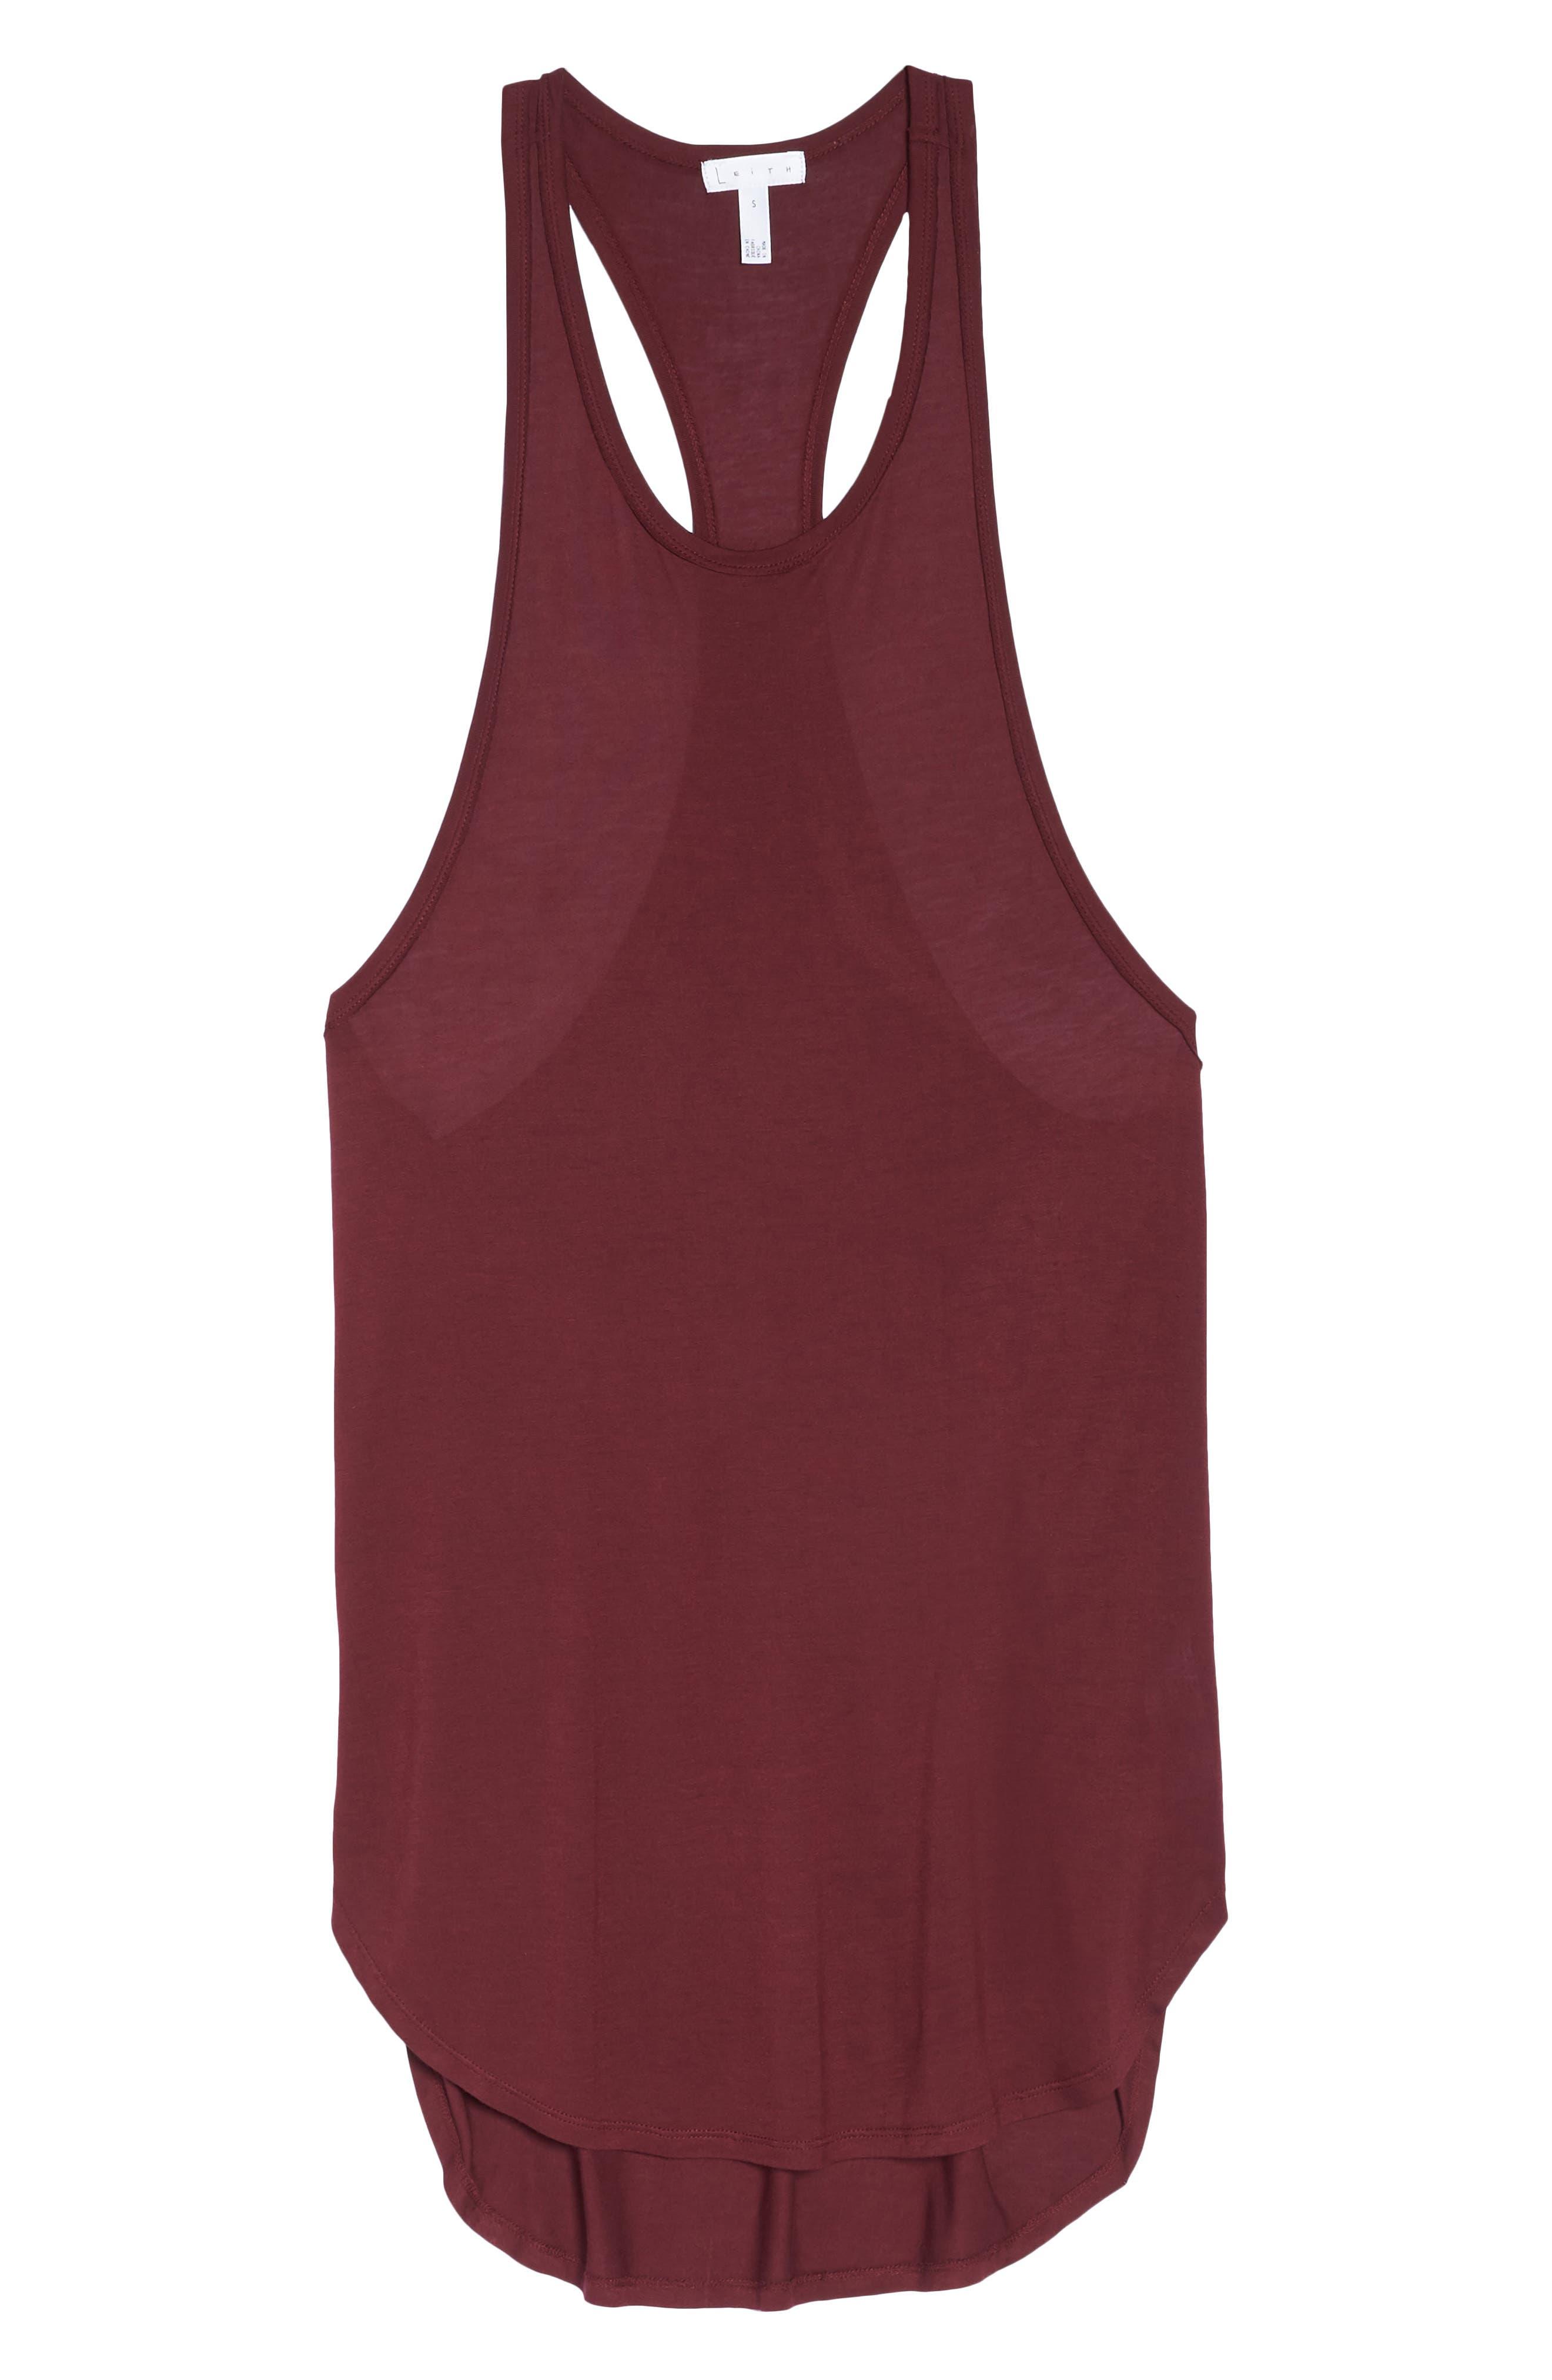 Racerback Cover-Up Tank Dress,                             Alternate thumbnail 6, color,                             BURGUNDY FIELD